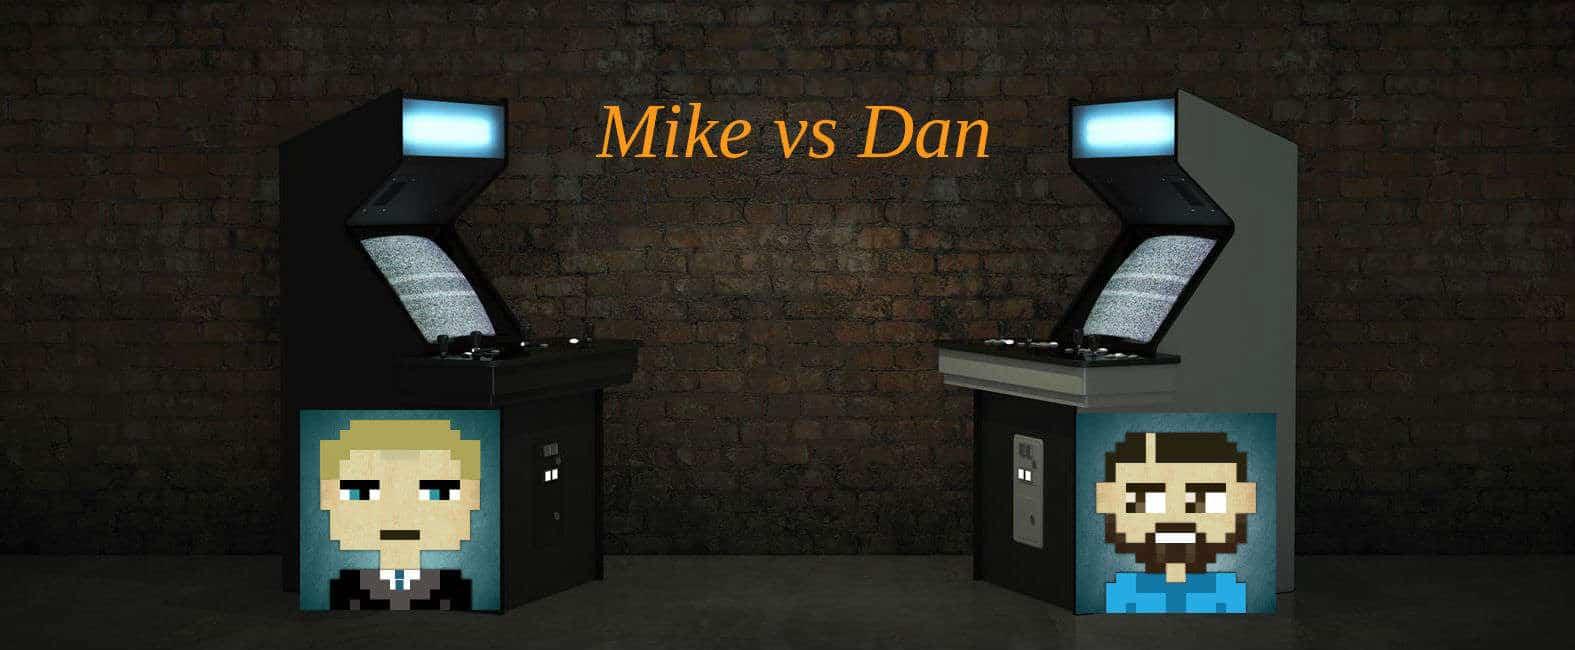 Mike vs Dan Gaming Competition